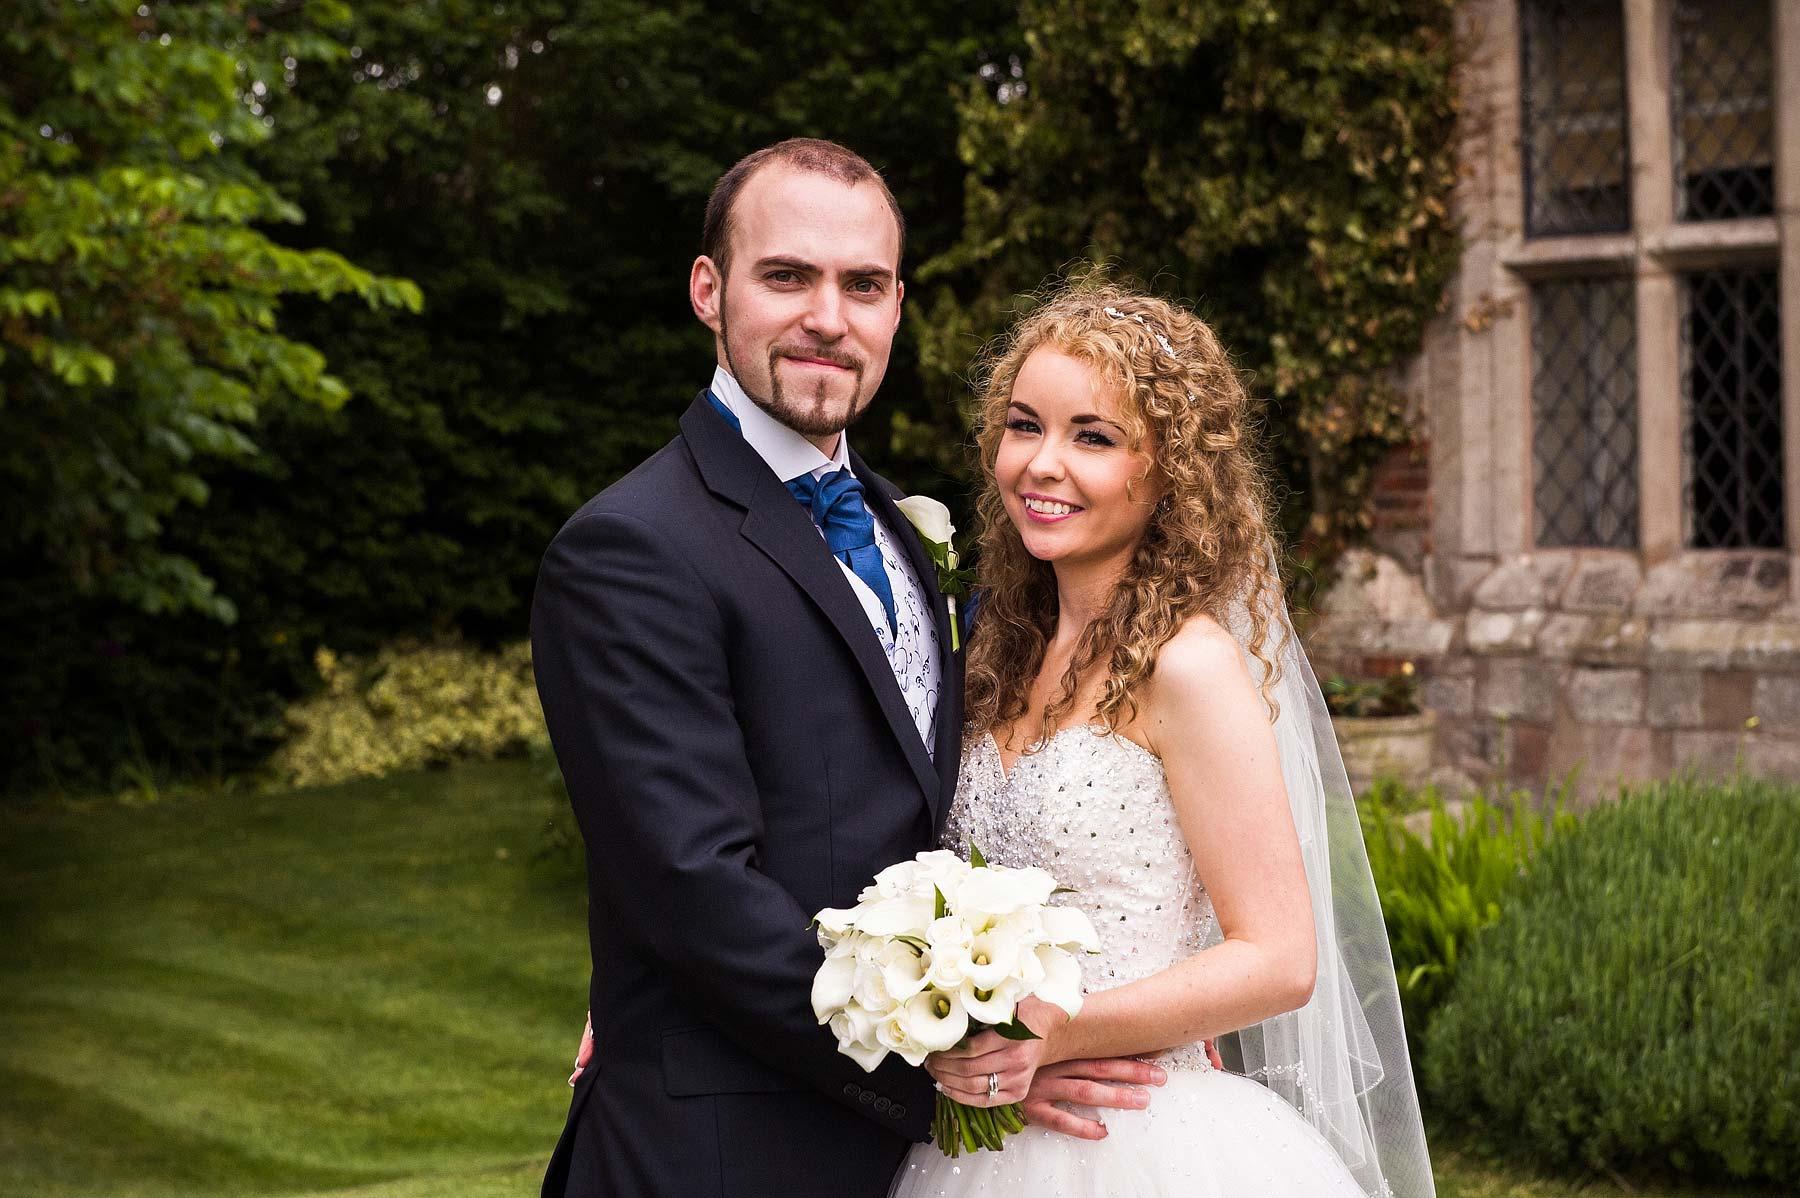 albright-hussey-manor-wedding-photographers-037